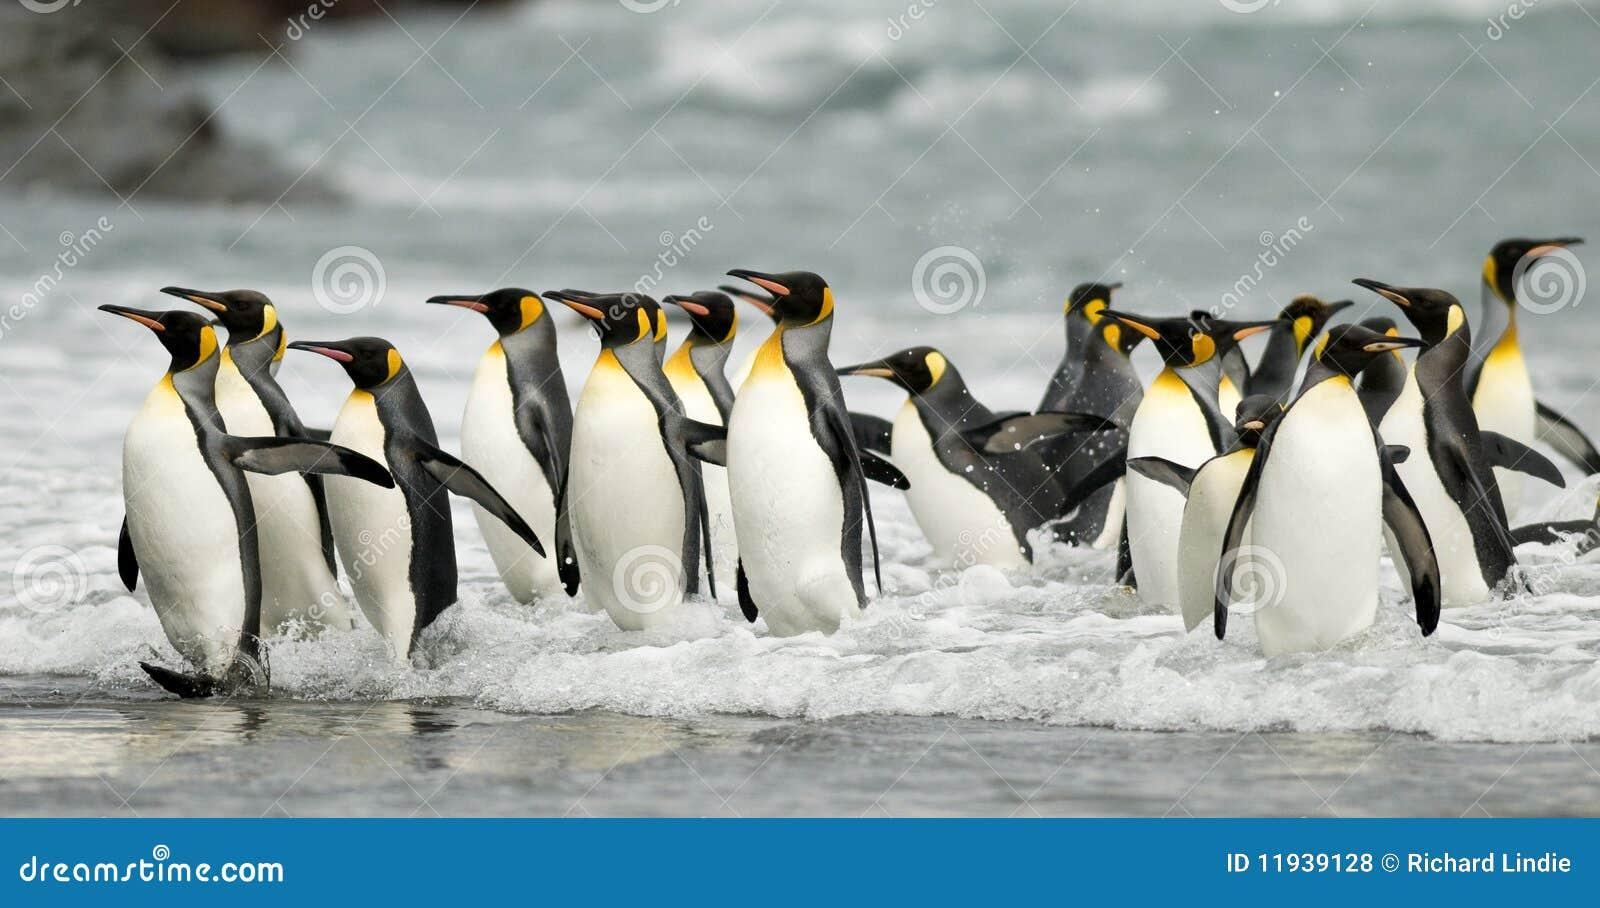 König Penguins in der Brandung